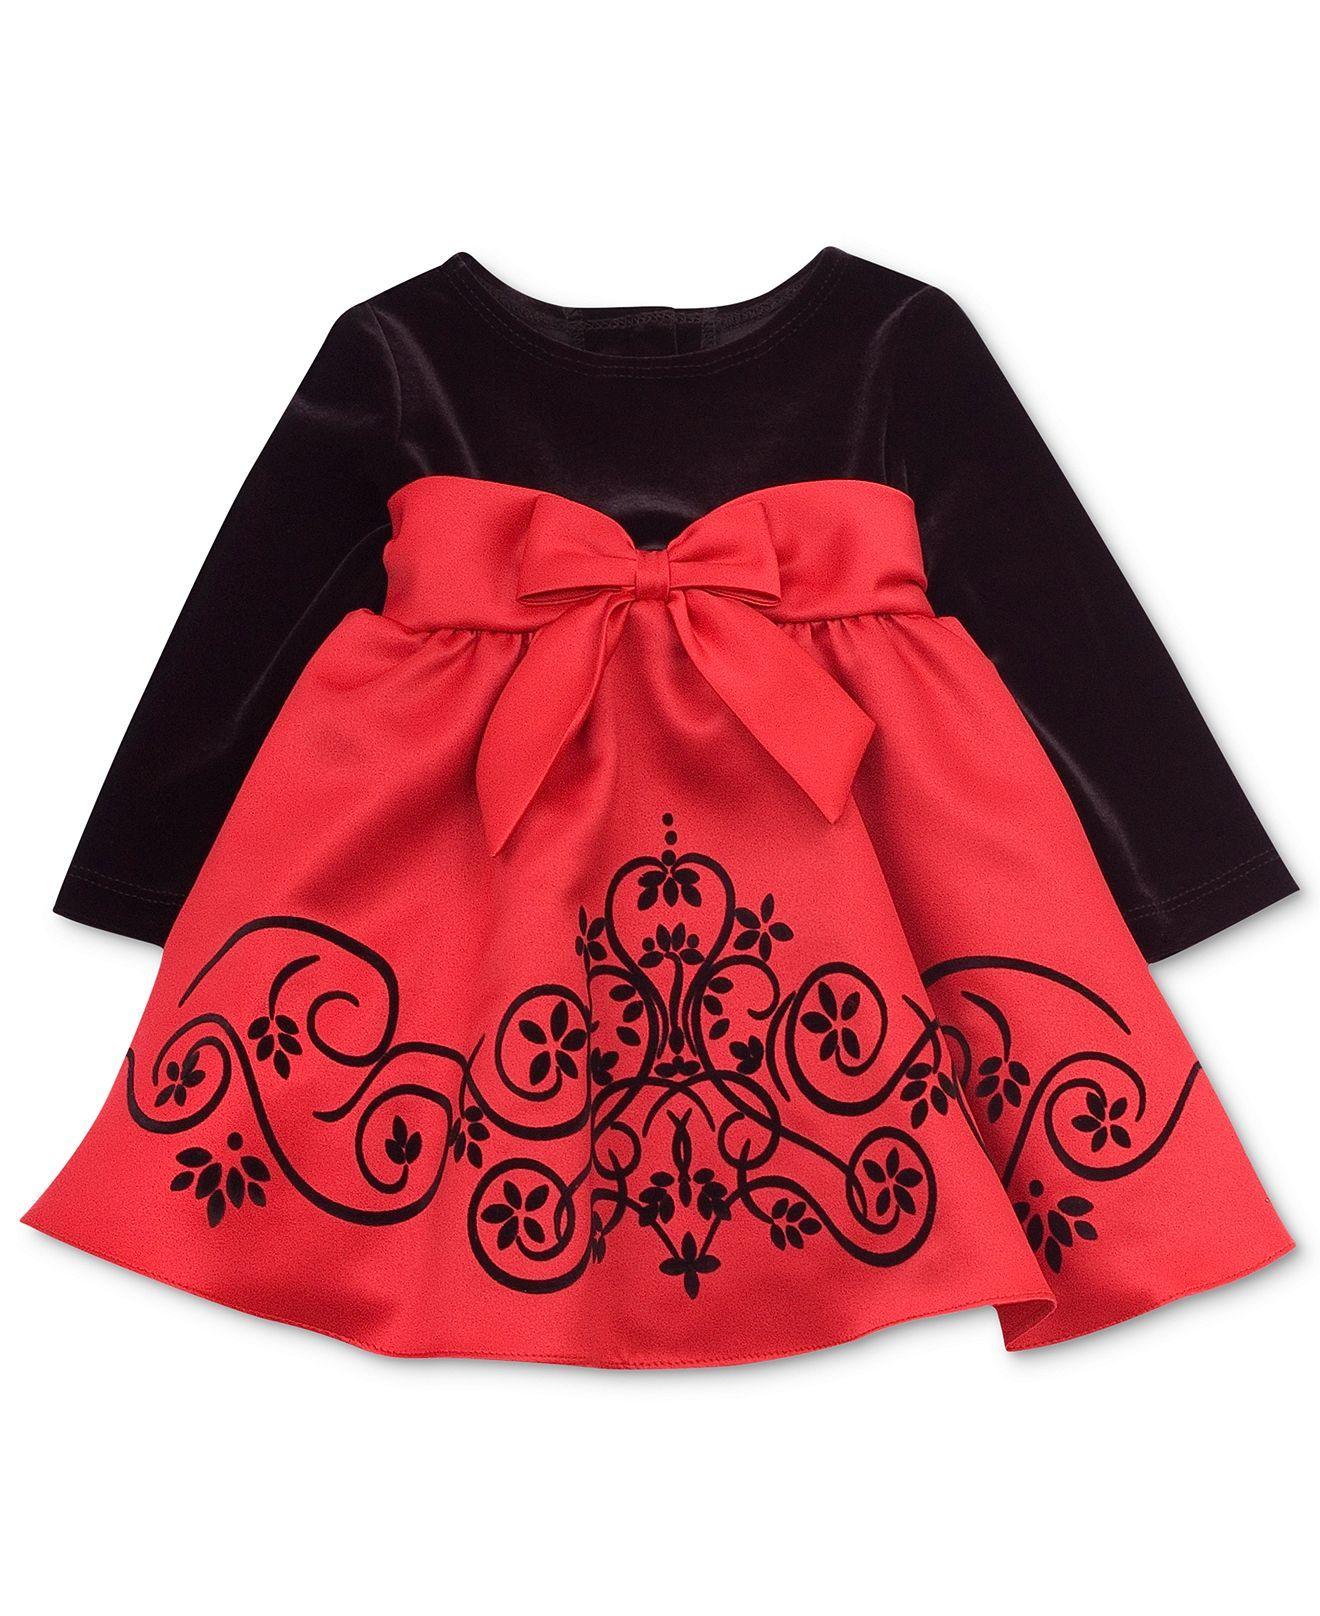 4c2b1150a Macys Holiday Dresses Toddlers | Saddha